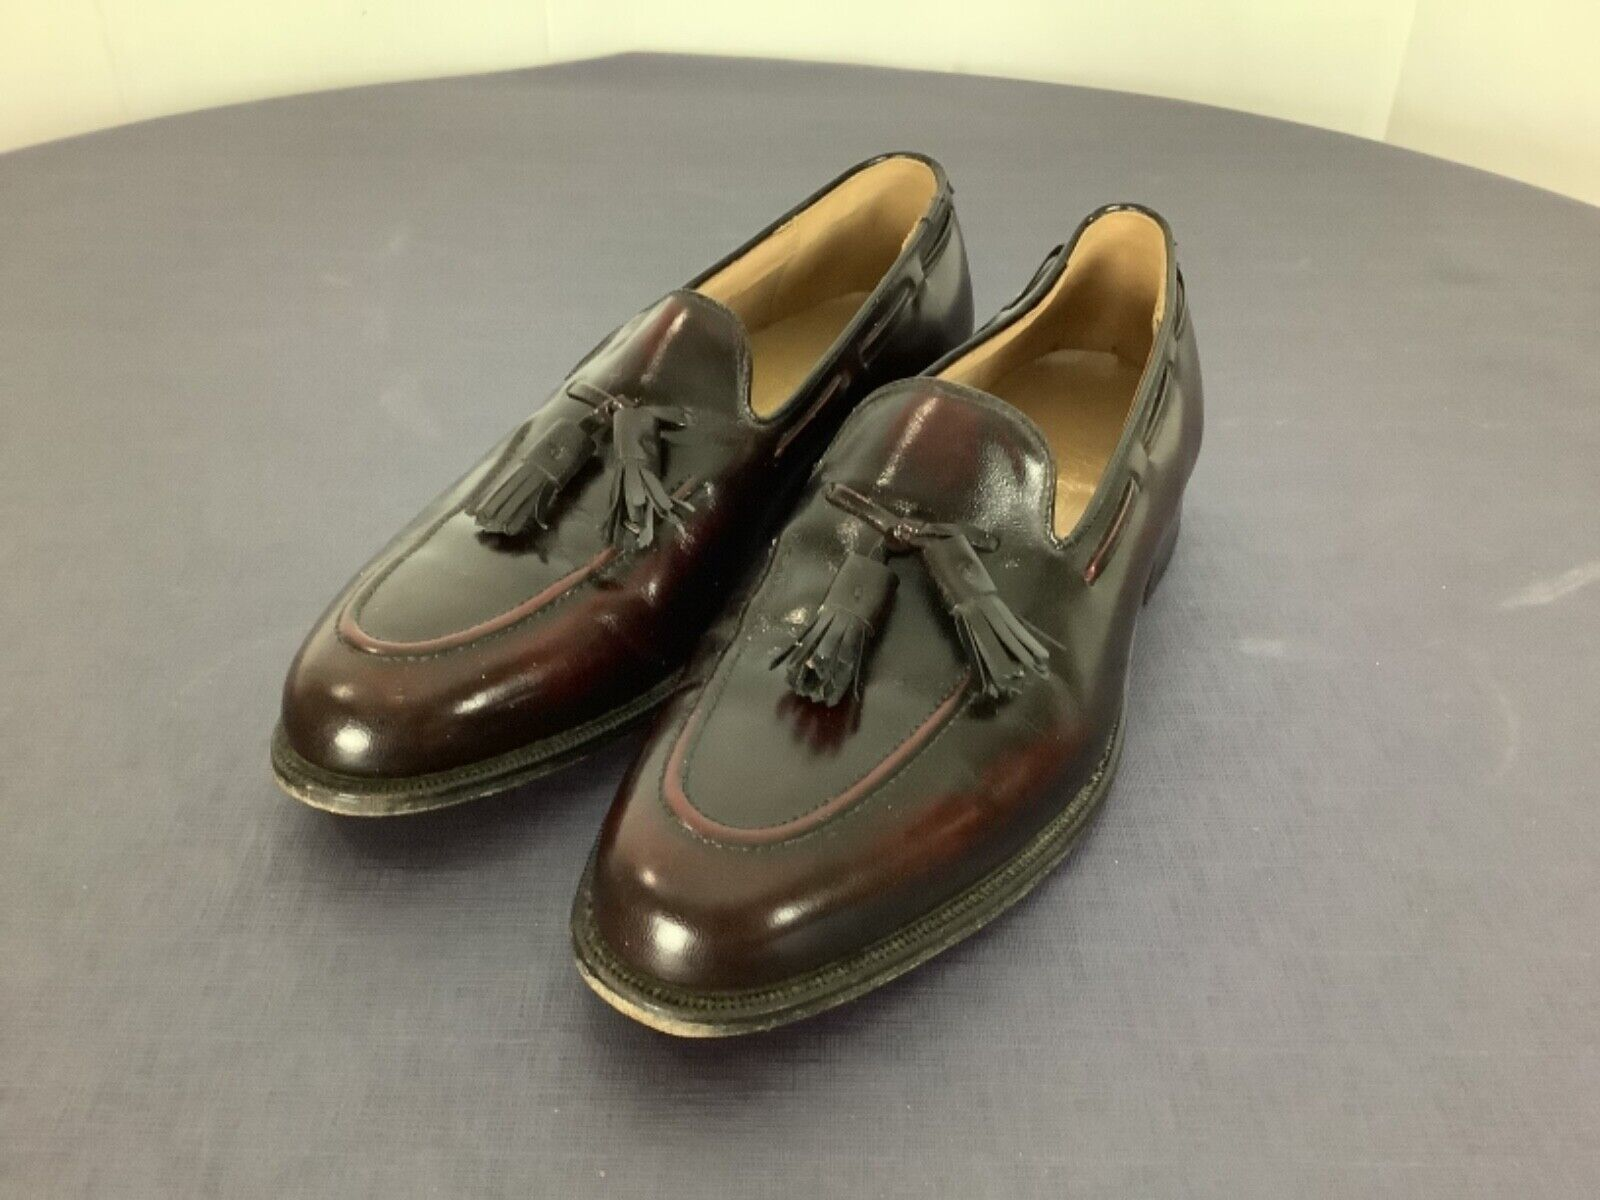 Johnston & Murphy Leather Tassel Loafer Made In USA Men's Size 8.5 D Oxblood